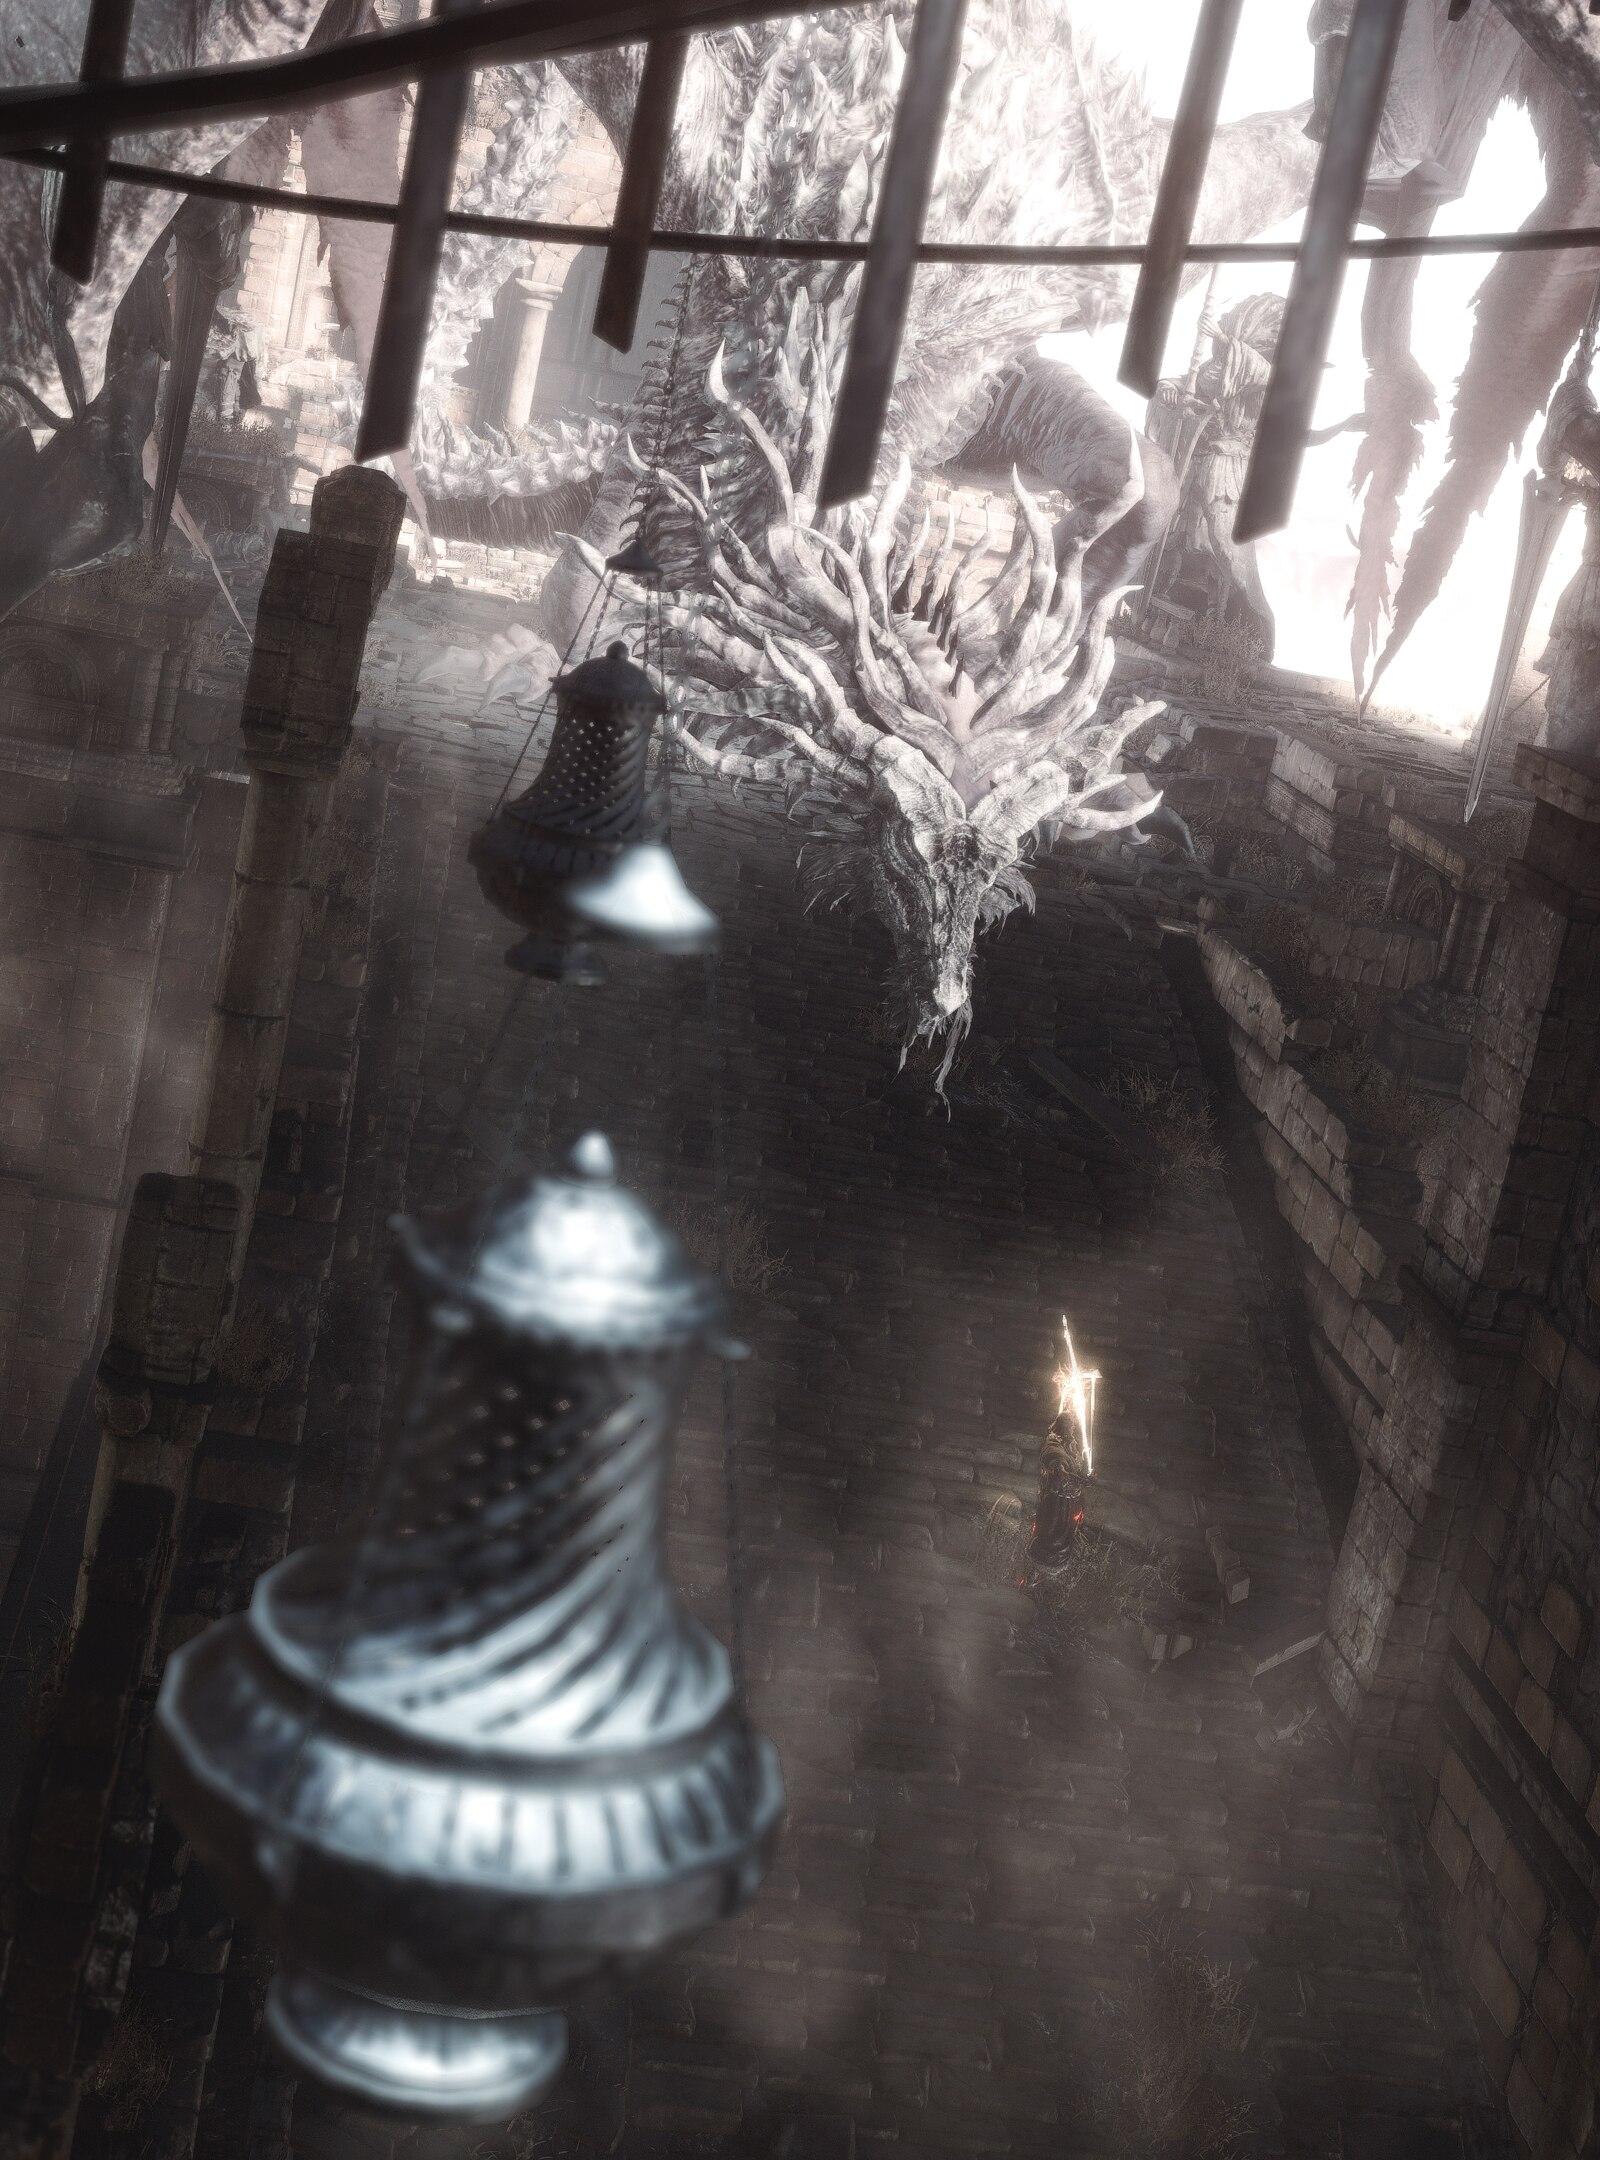 fdgfdh.jpg - Dark Souls 3